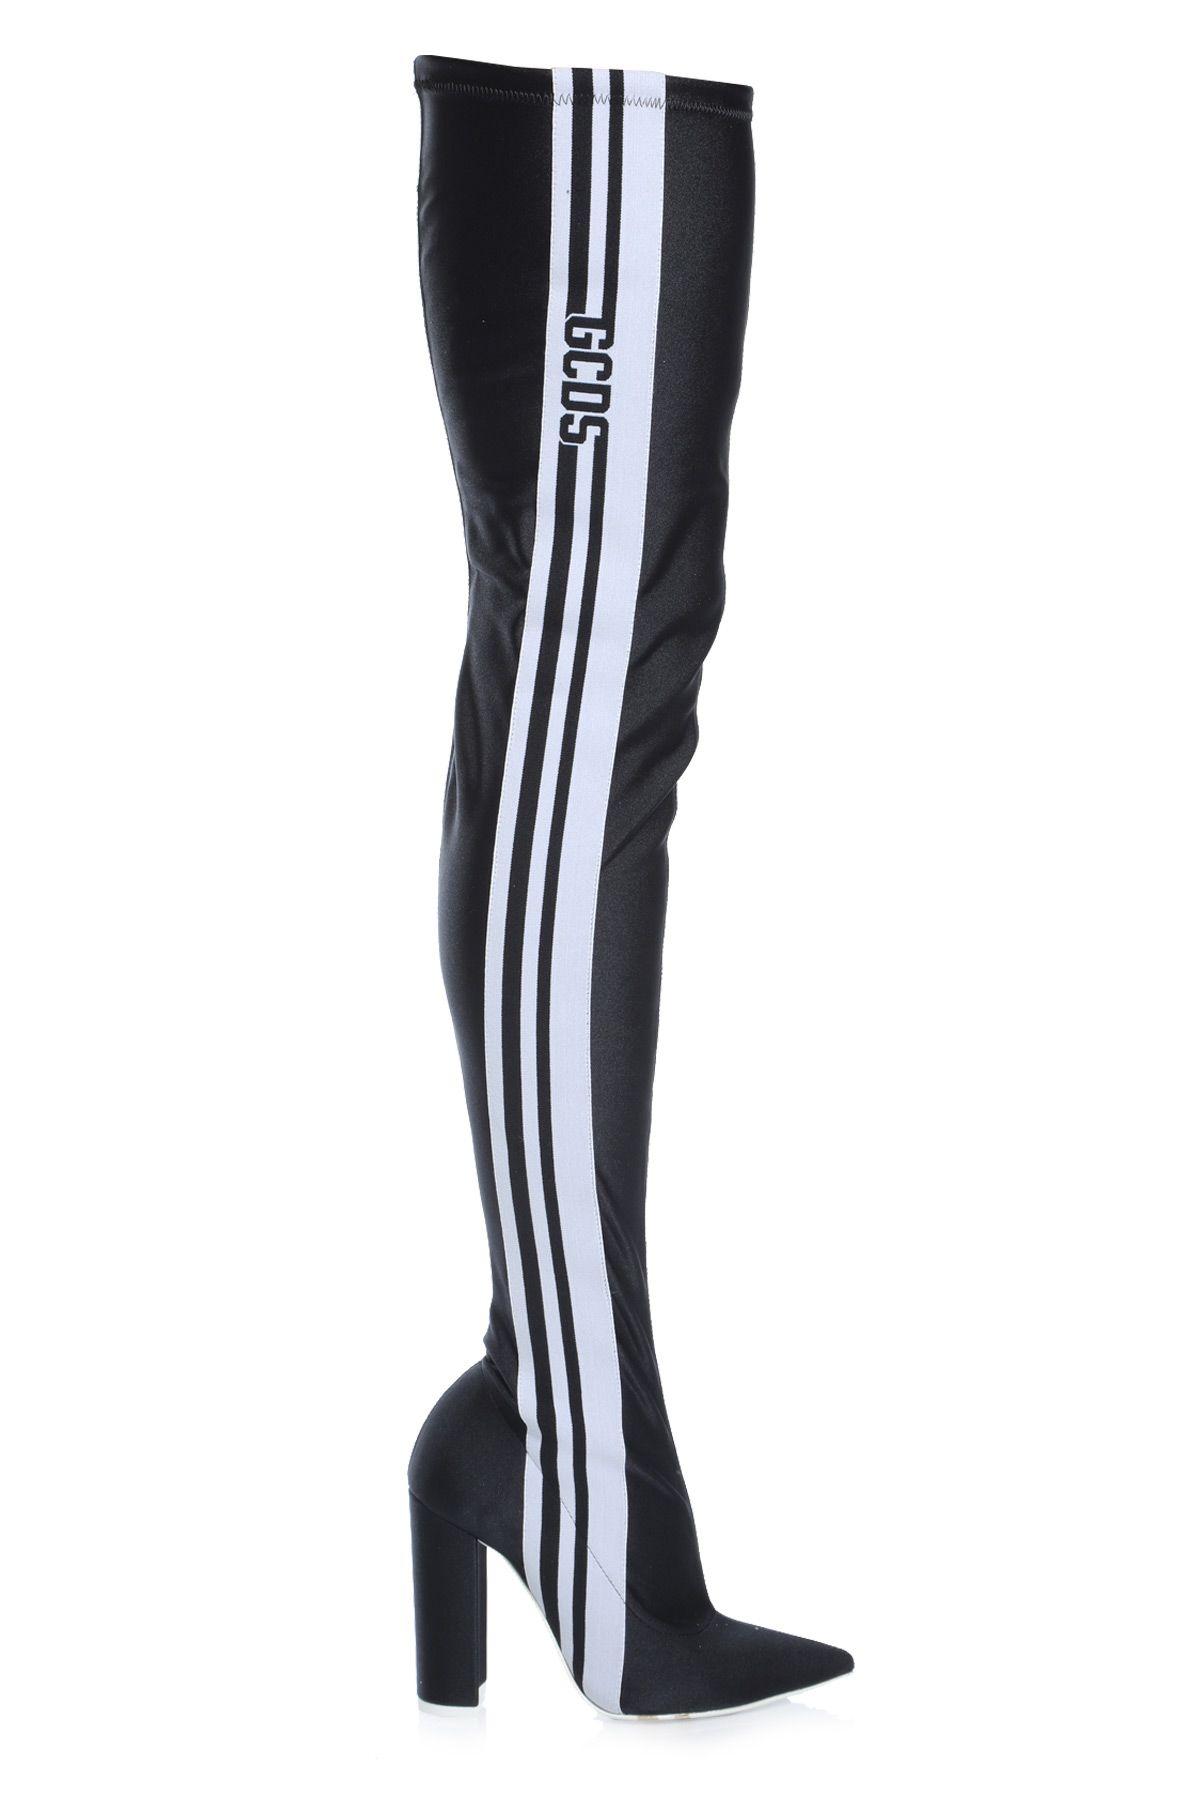 Gcds 110Mm Stripe Lycra Thigh High Boots In Black